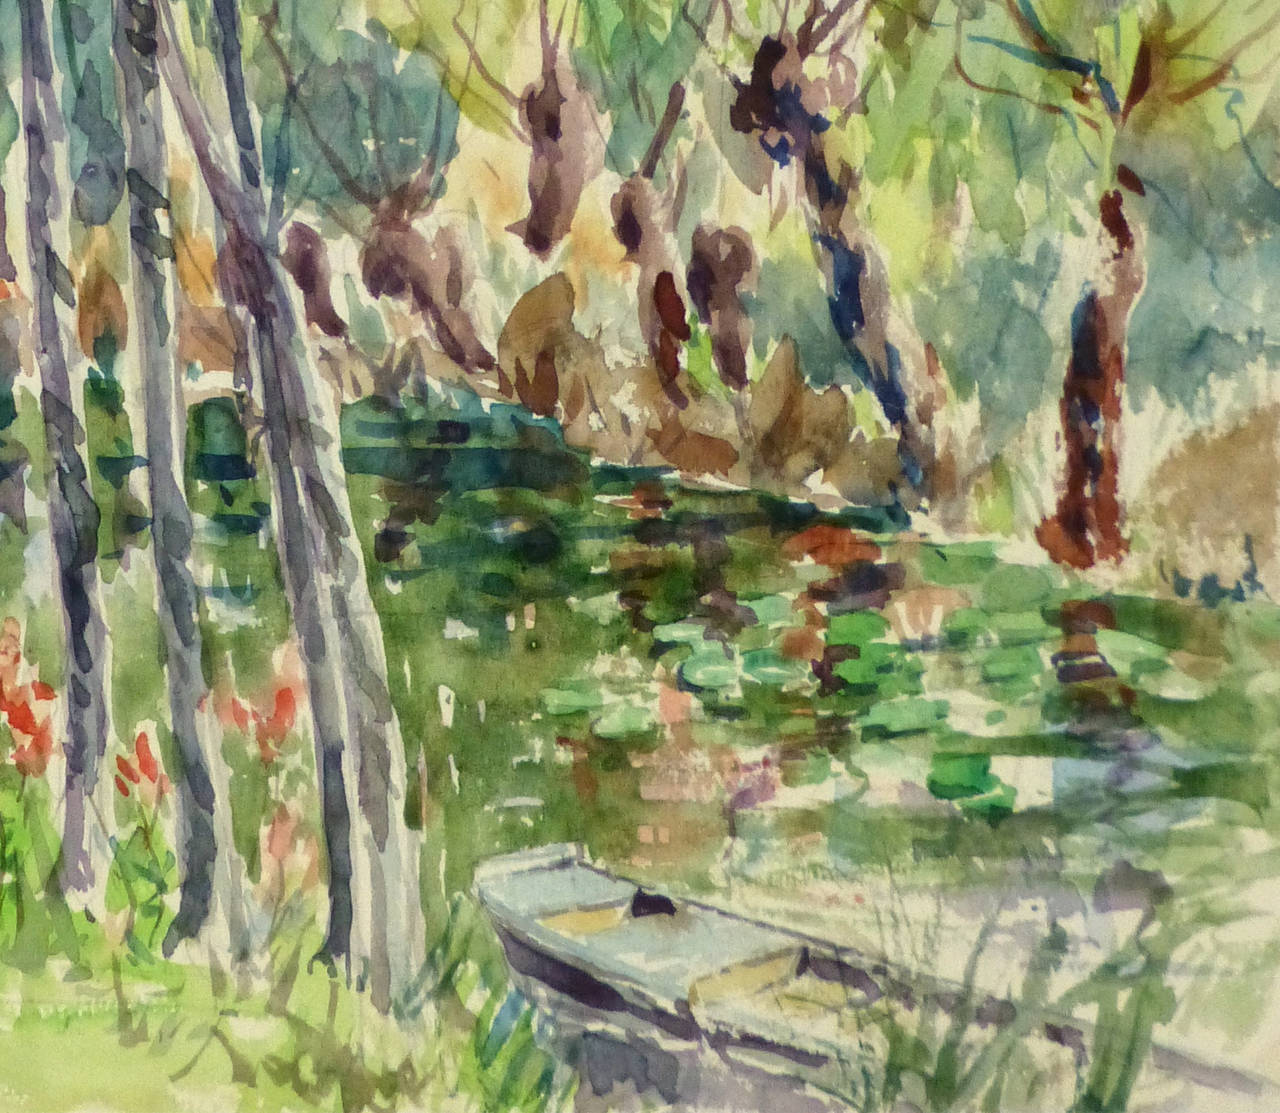 Vintage French Watercolor Landscape - Black Landscape Art by Roger Tochon